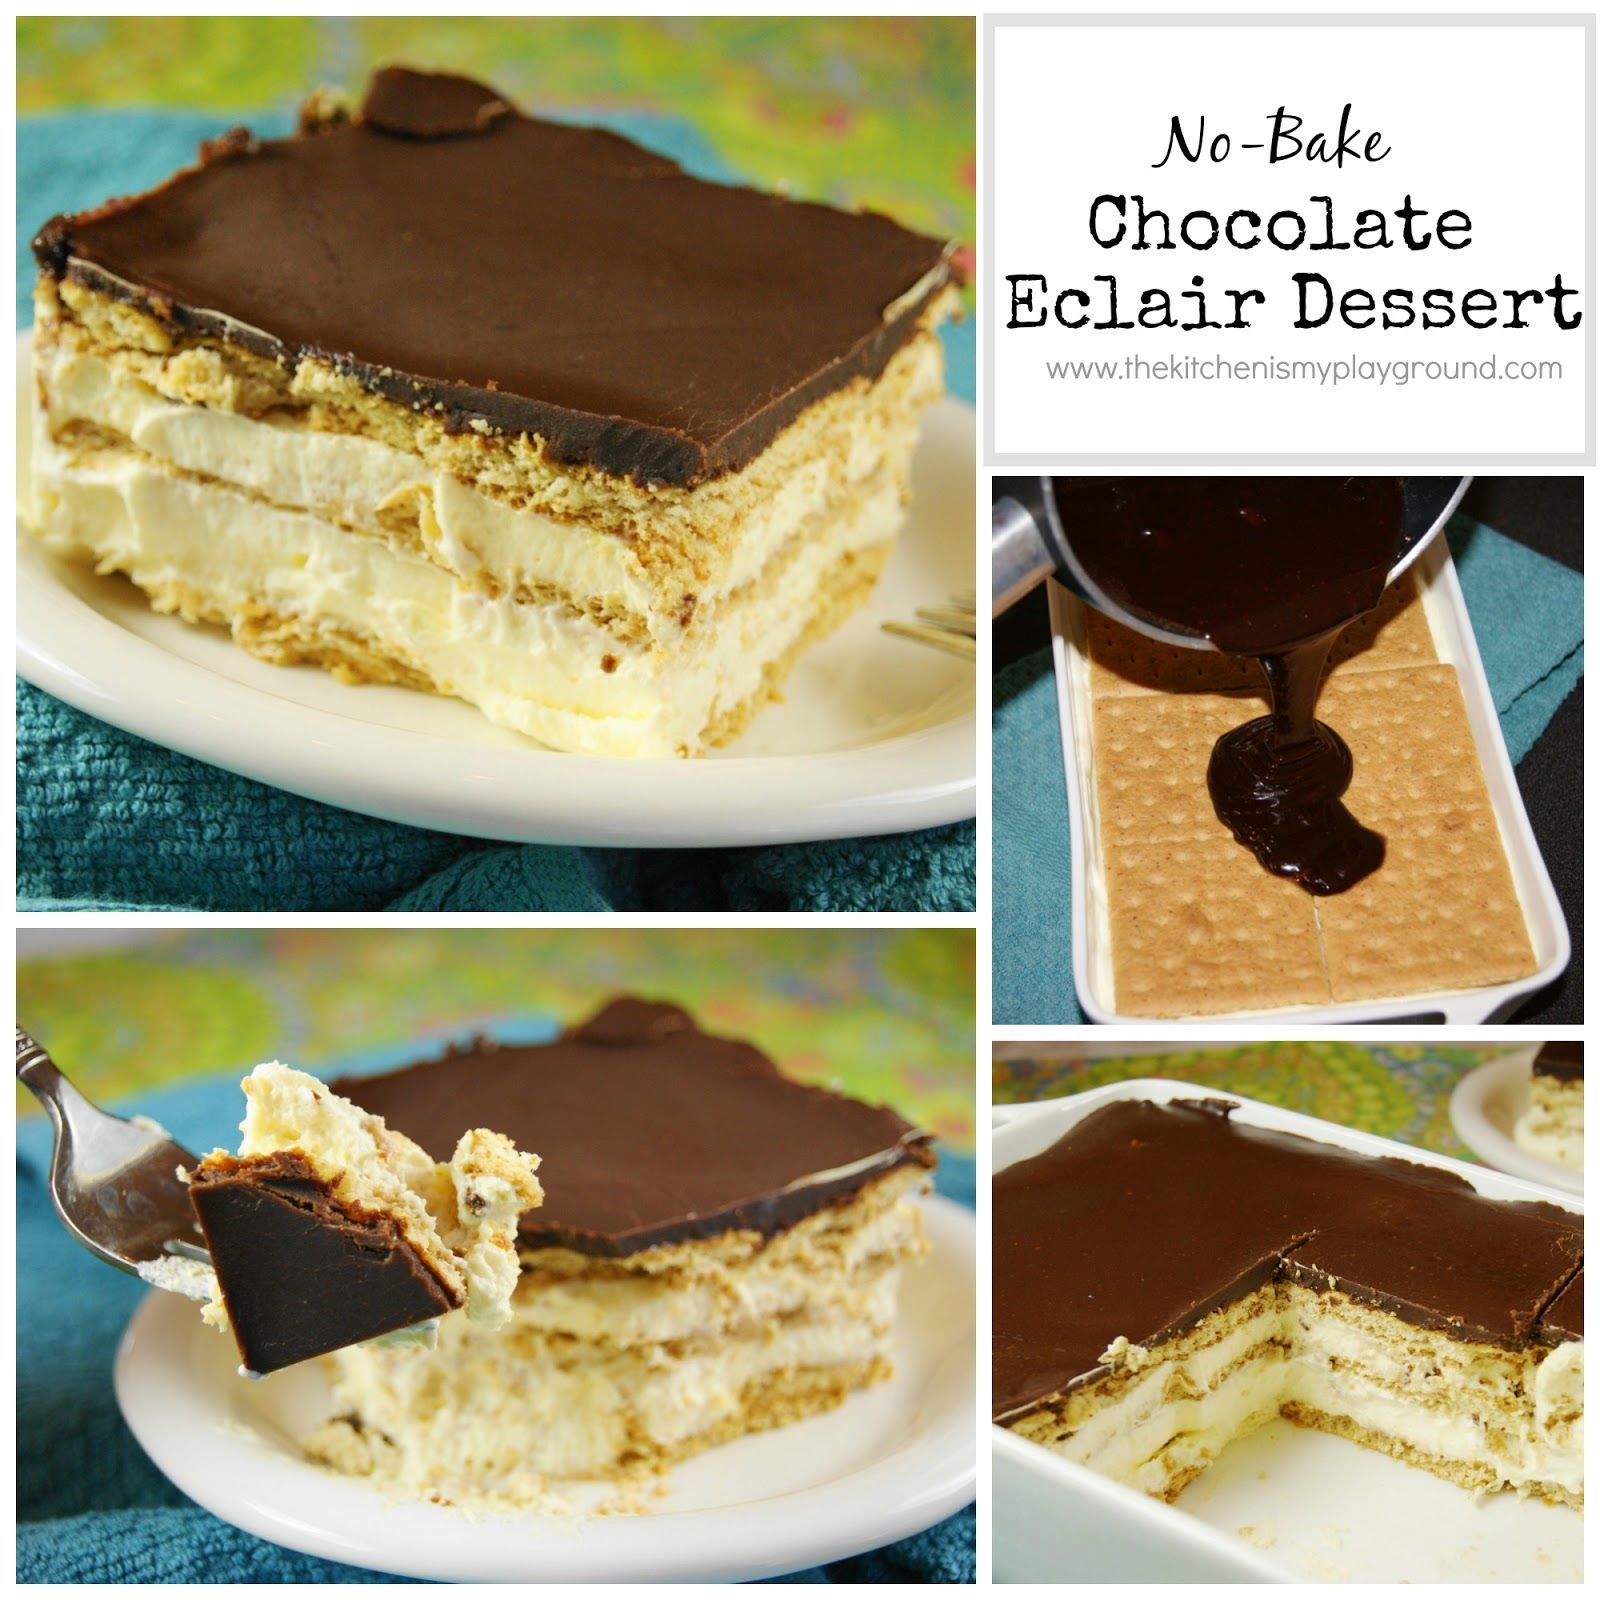 No-Bake Chocolate Eclair Dessert | Chocolate eclairs, Eclairs and ...